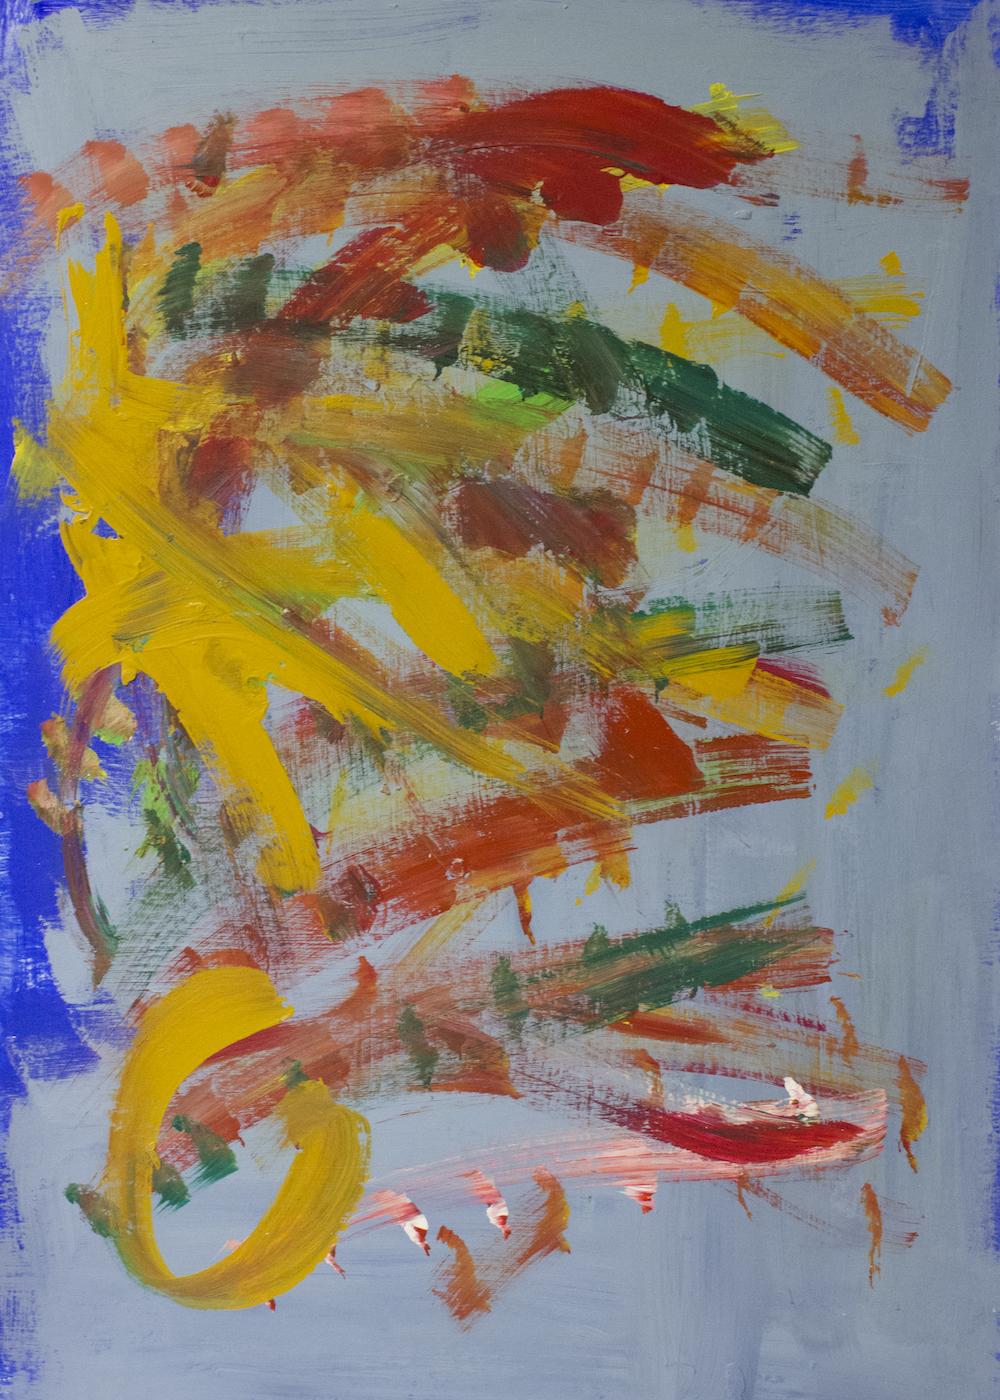 """The coloured life"" - Ghassan, Syria, Lebanon"